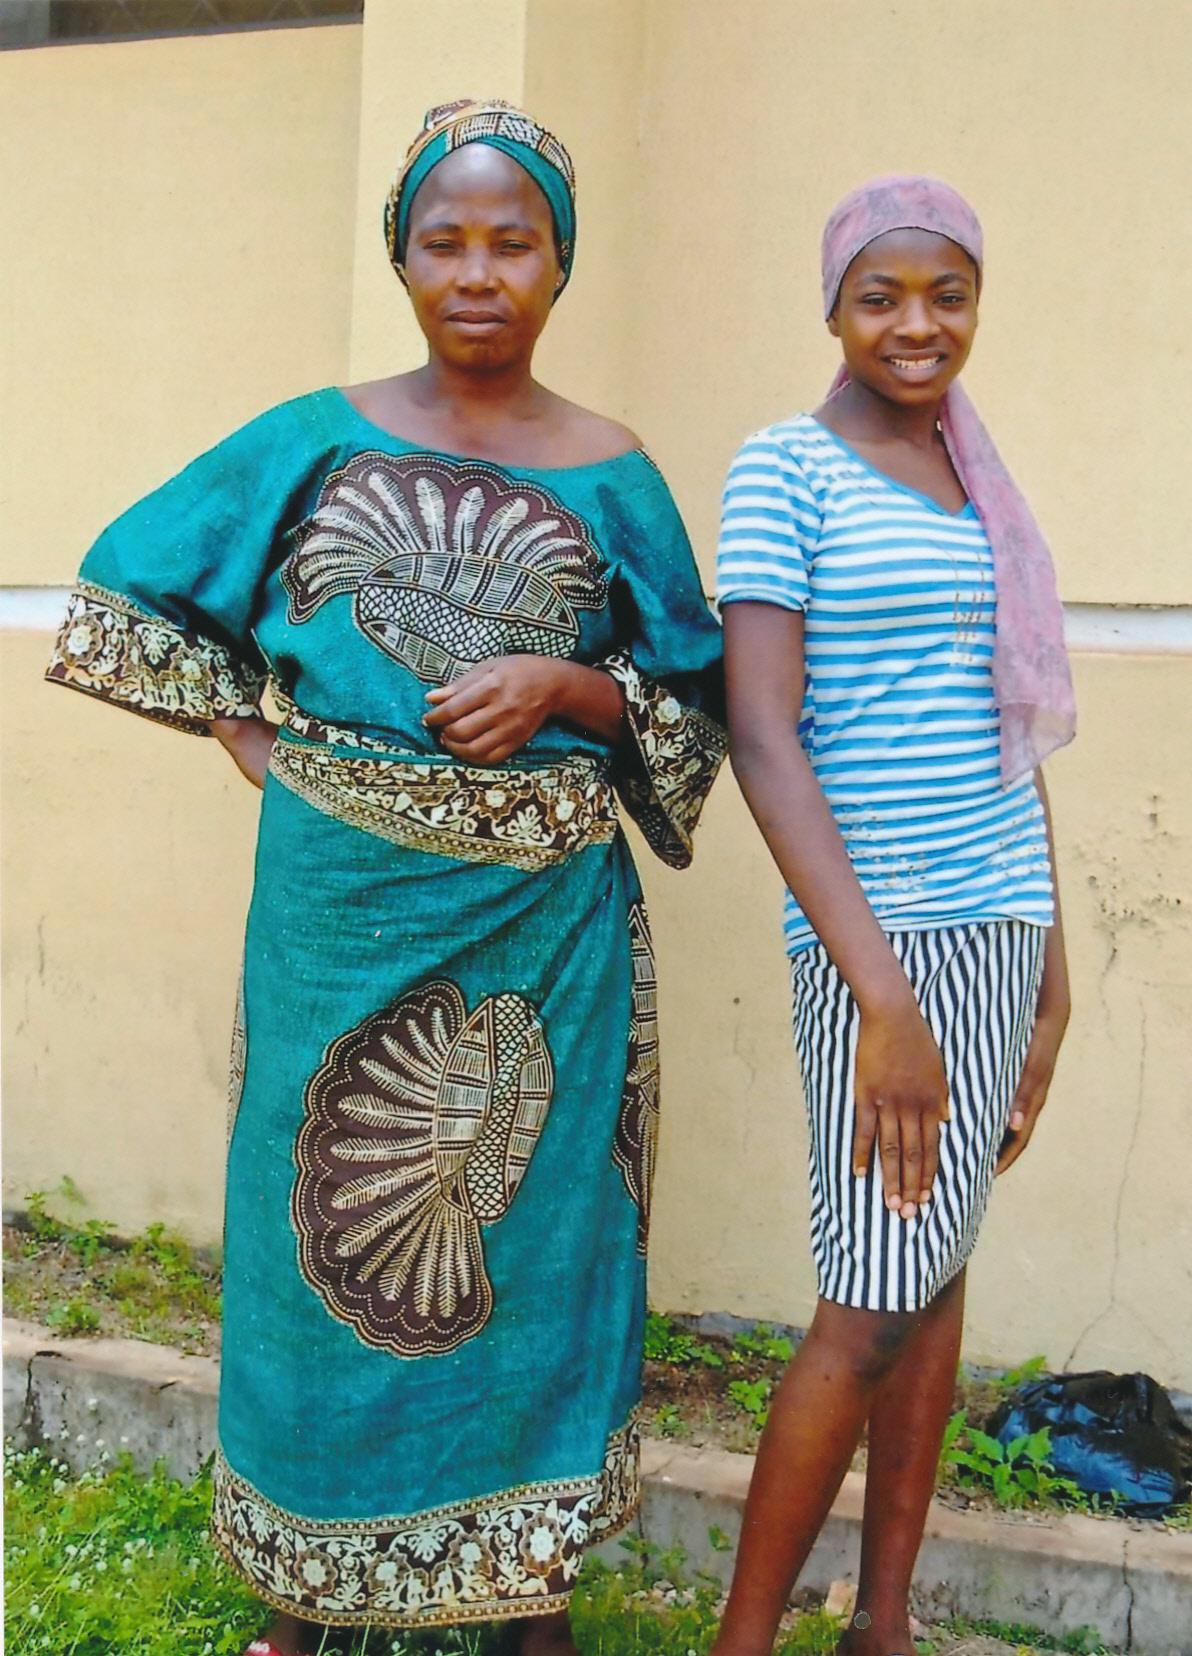 Kadijat and her mother